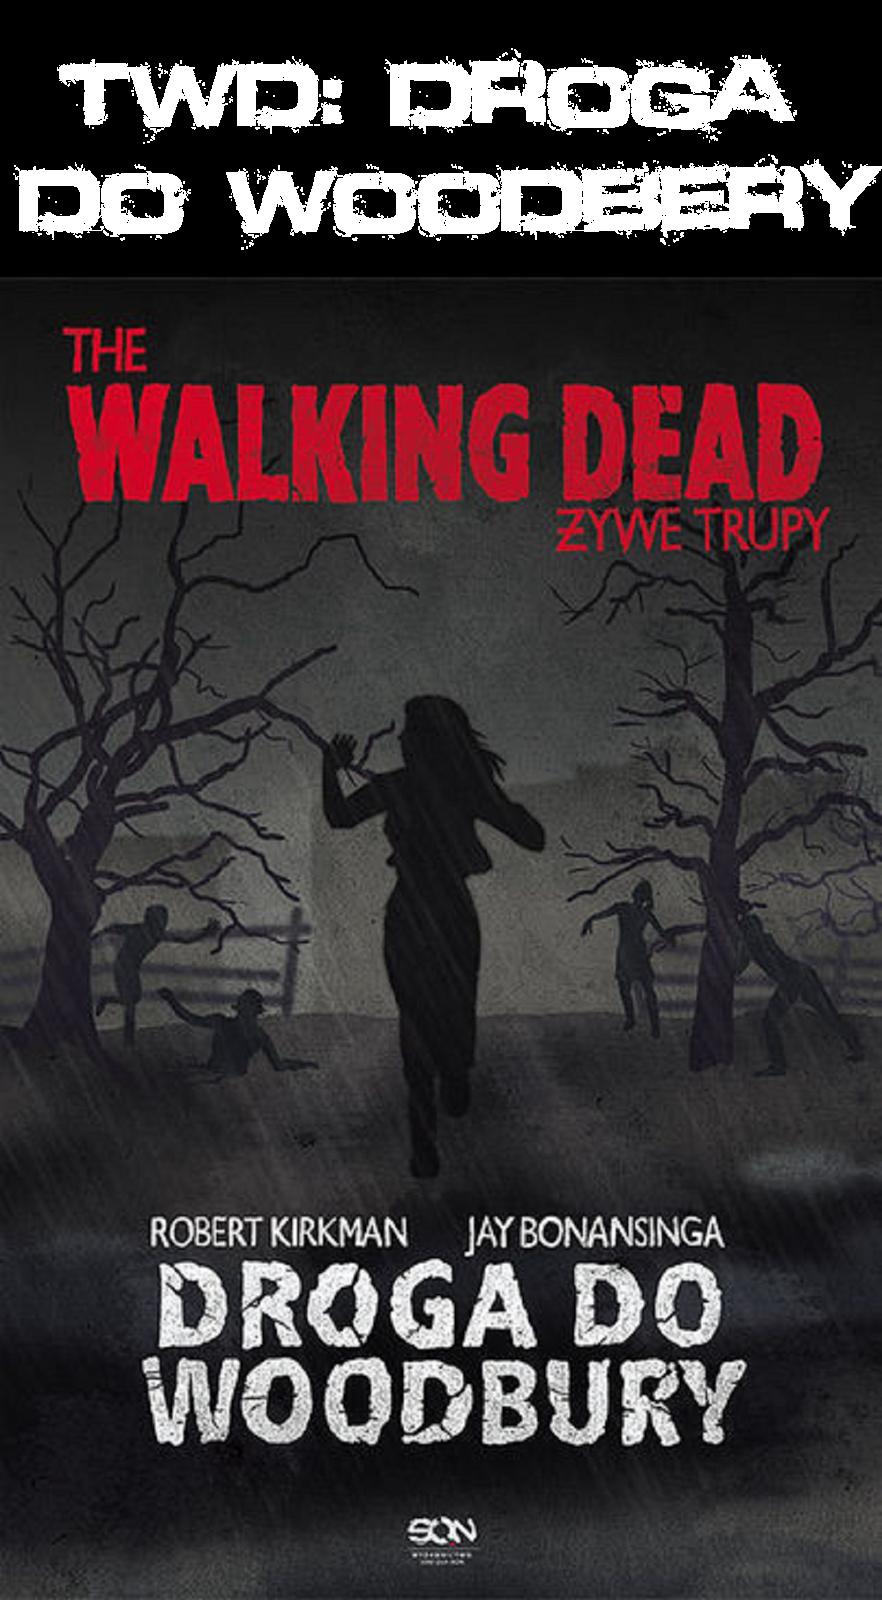 http://radioaktywne-recenzje.blogspot.com/2013/10/walking-dead-droga-do-woodbury.html